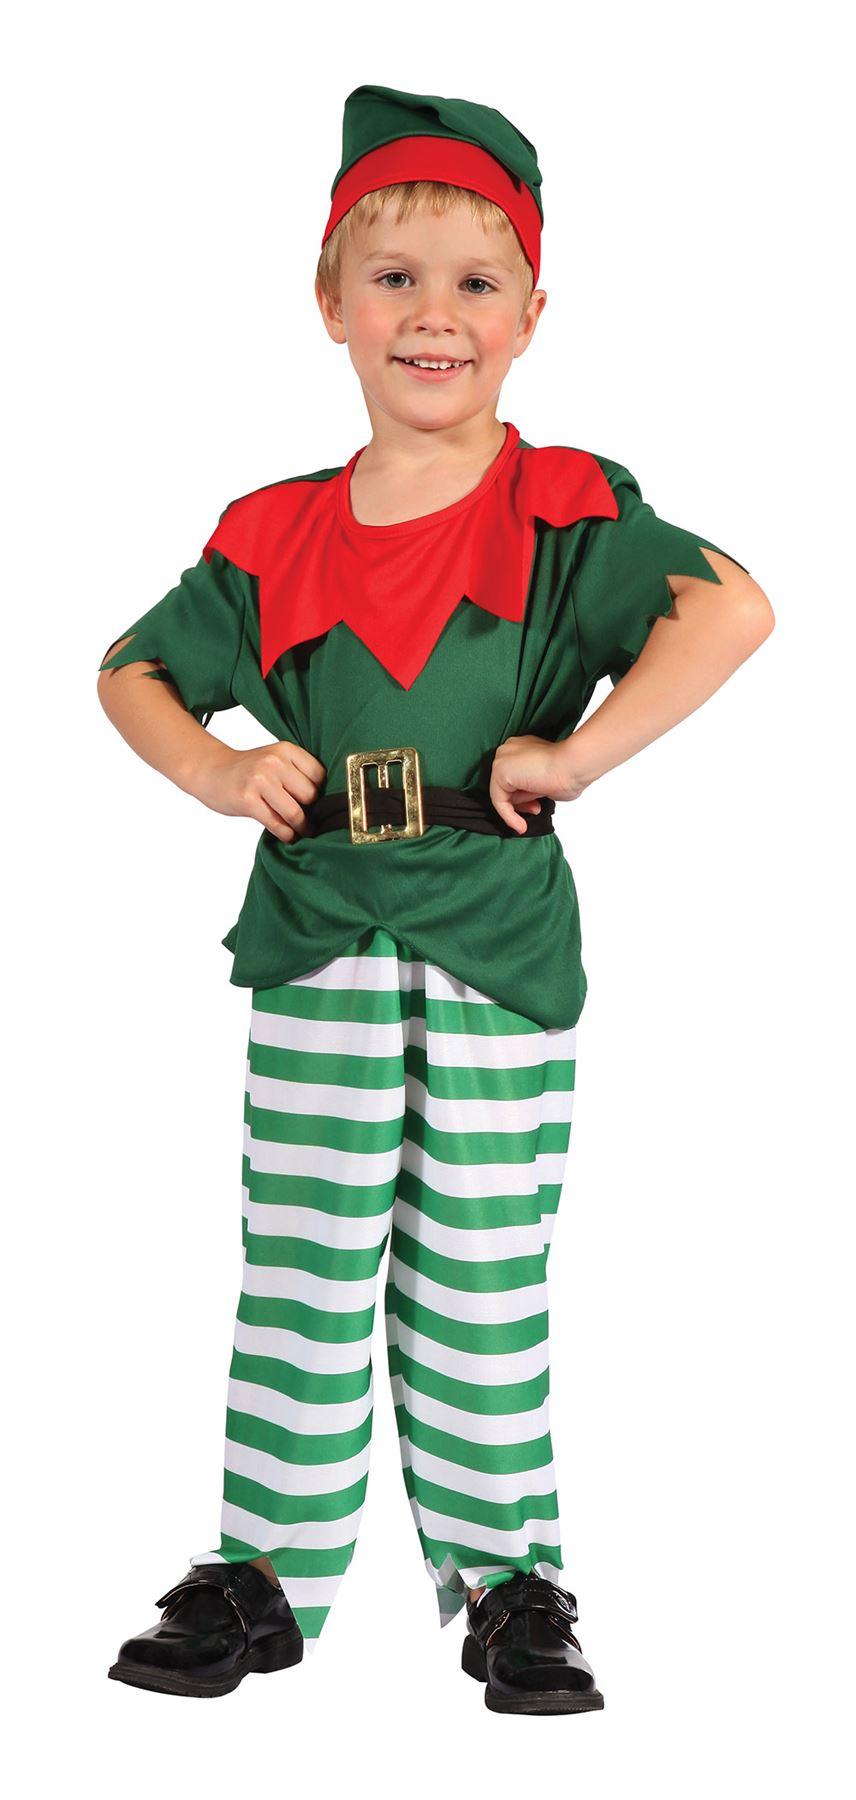 Elf costume toddler childrens christmas fancy dress age 2 3 au ebay